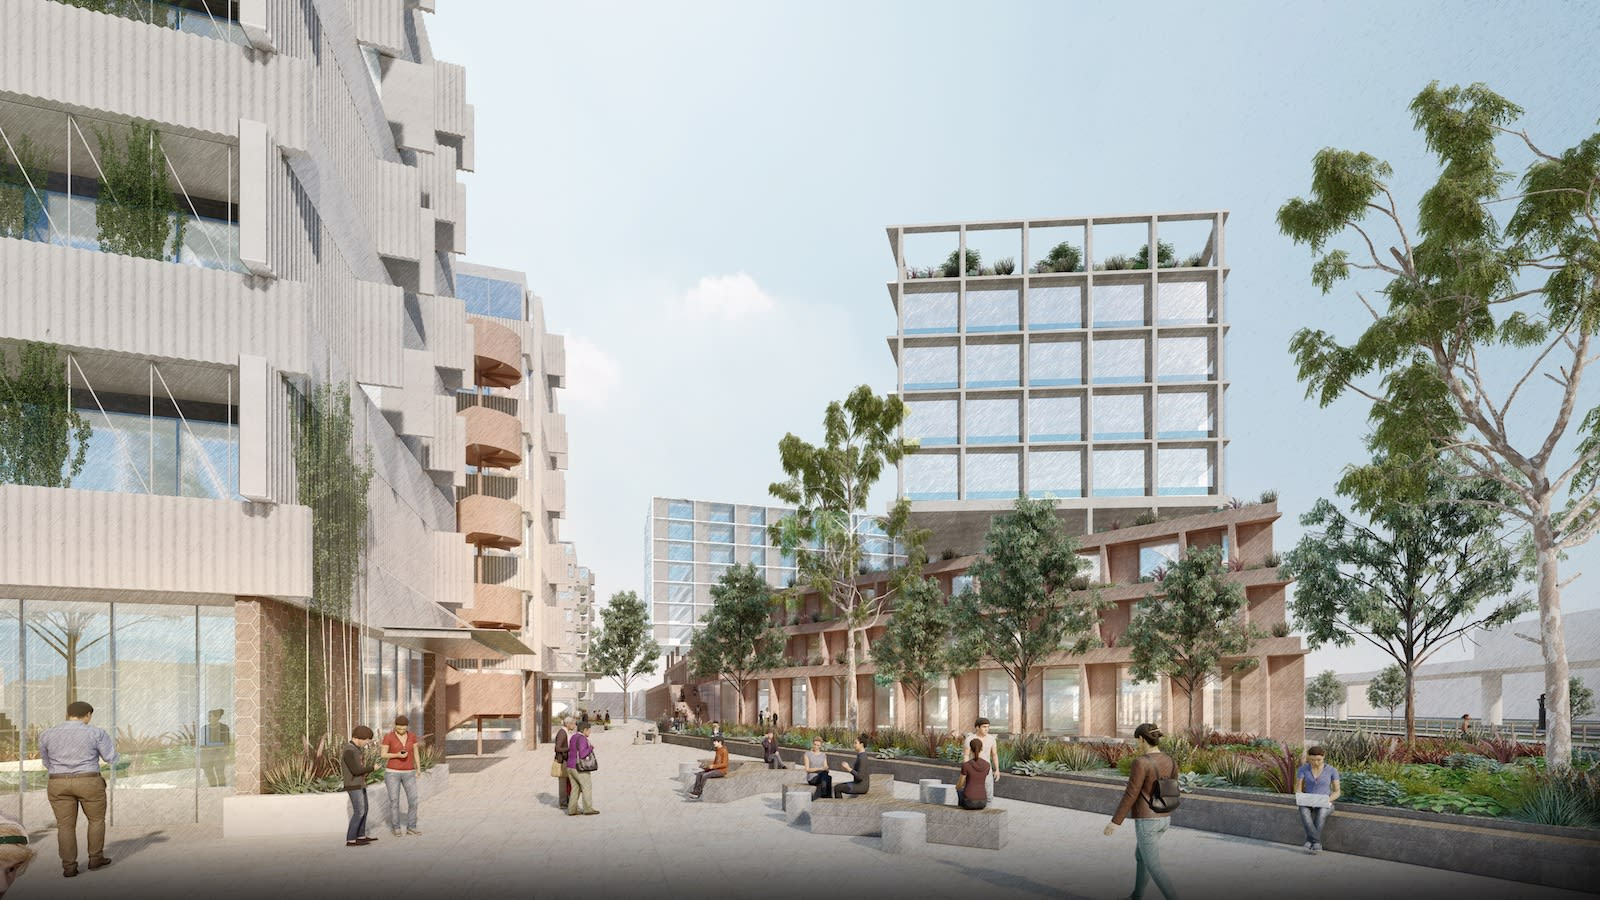 Assemble strike $1.5 billion affordable housing deal with Housing Choices Australia